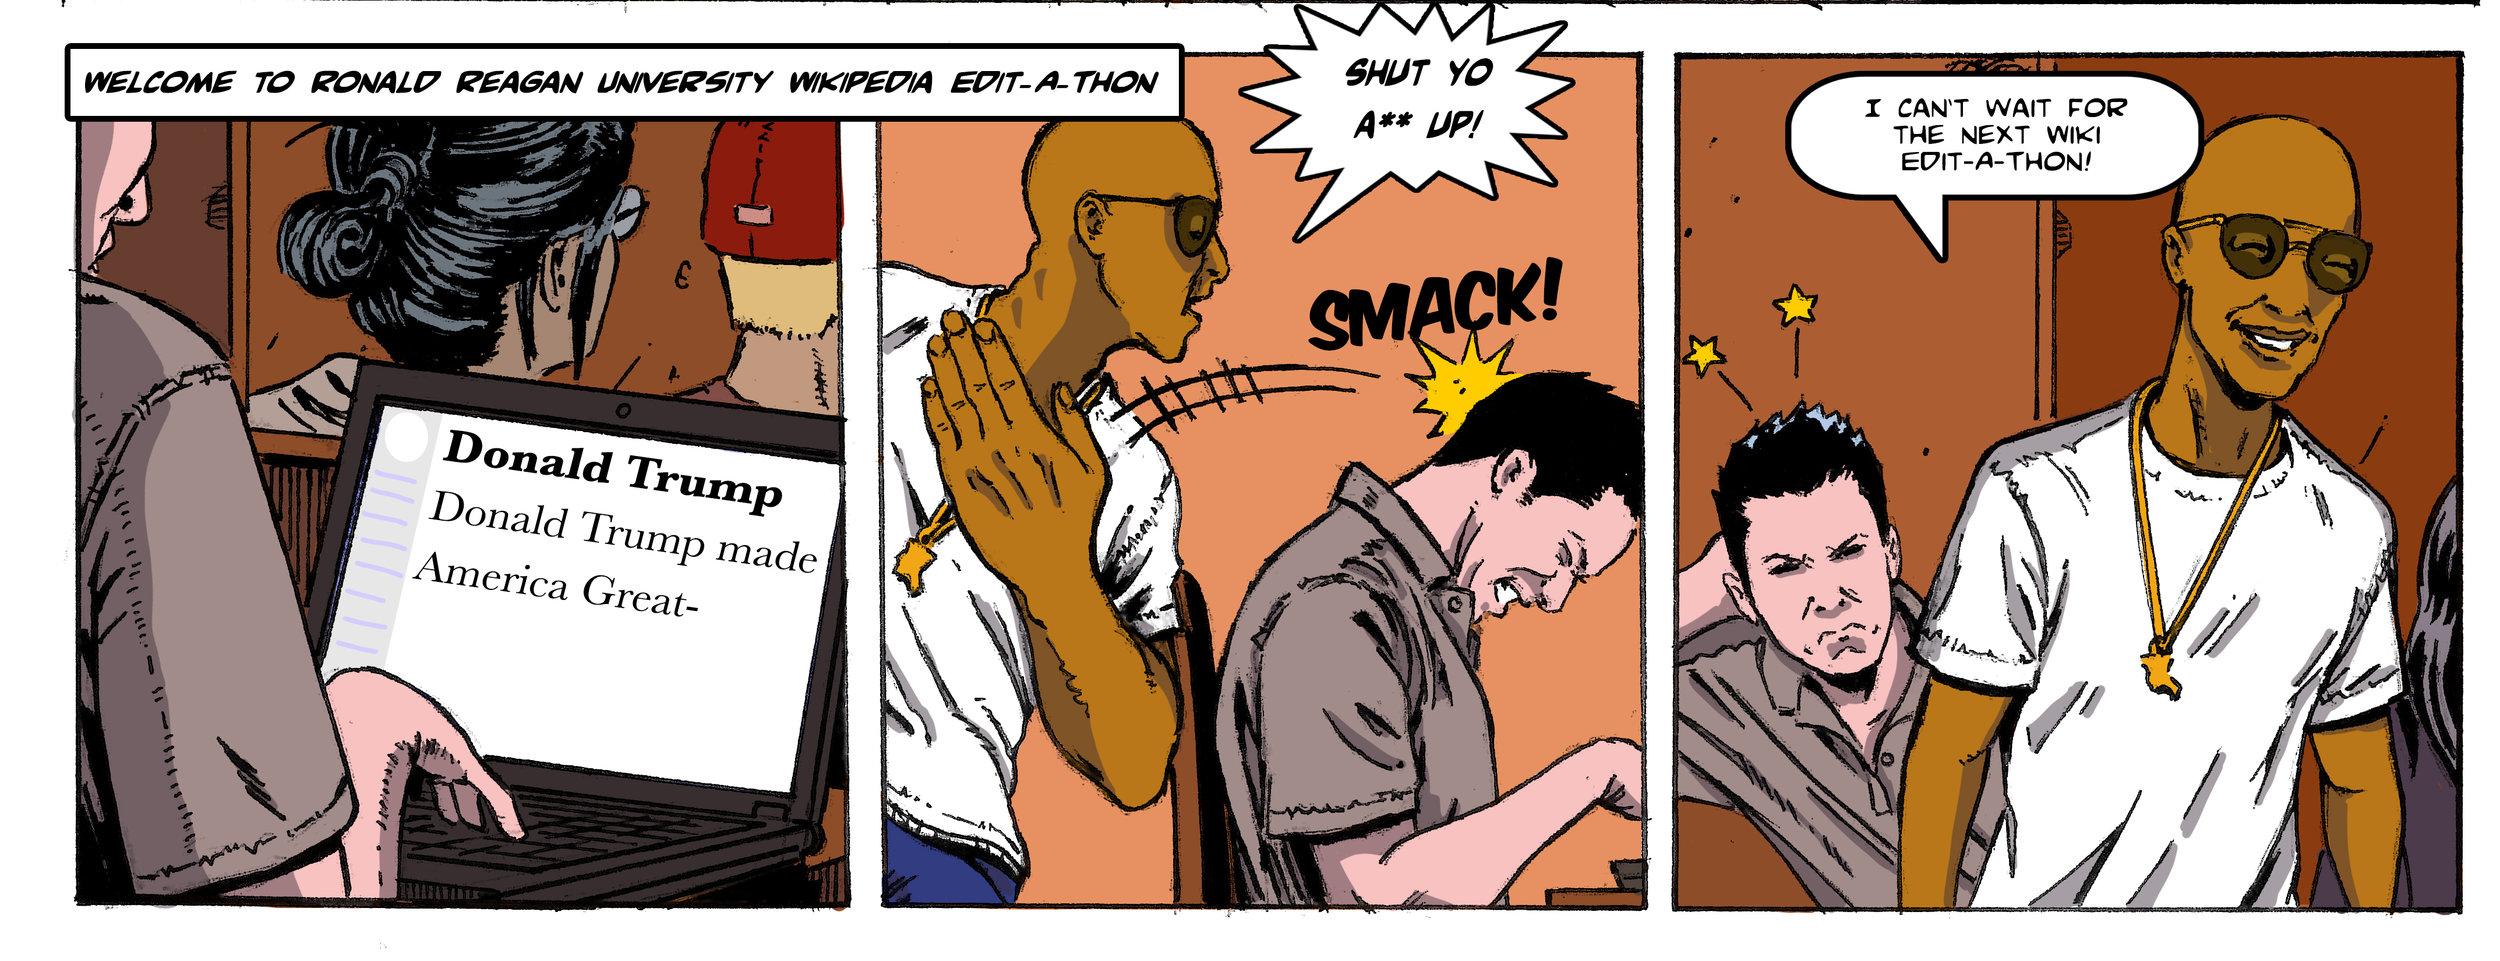 (H)af Comic Strip #88.jpg